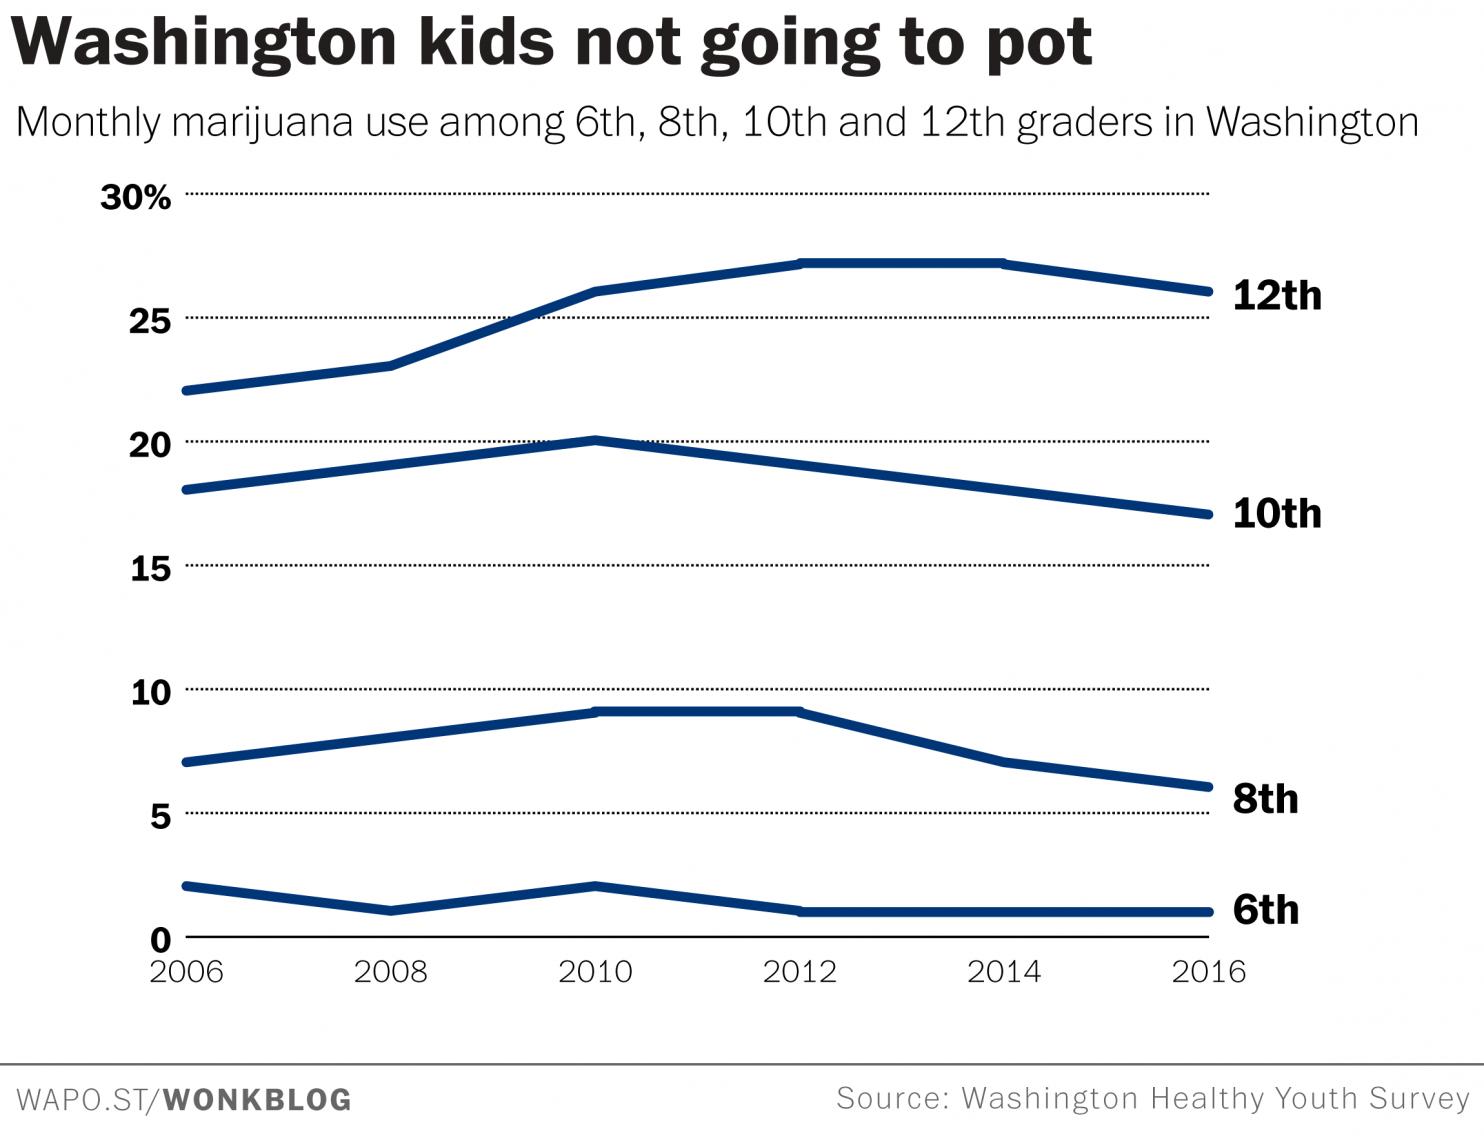 Risultati invariati sondaggio marijuana washington